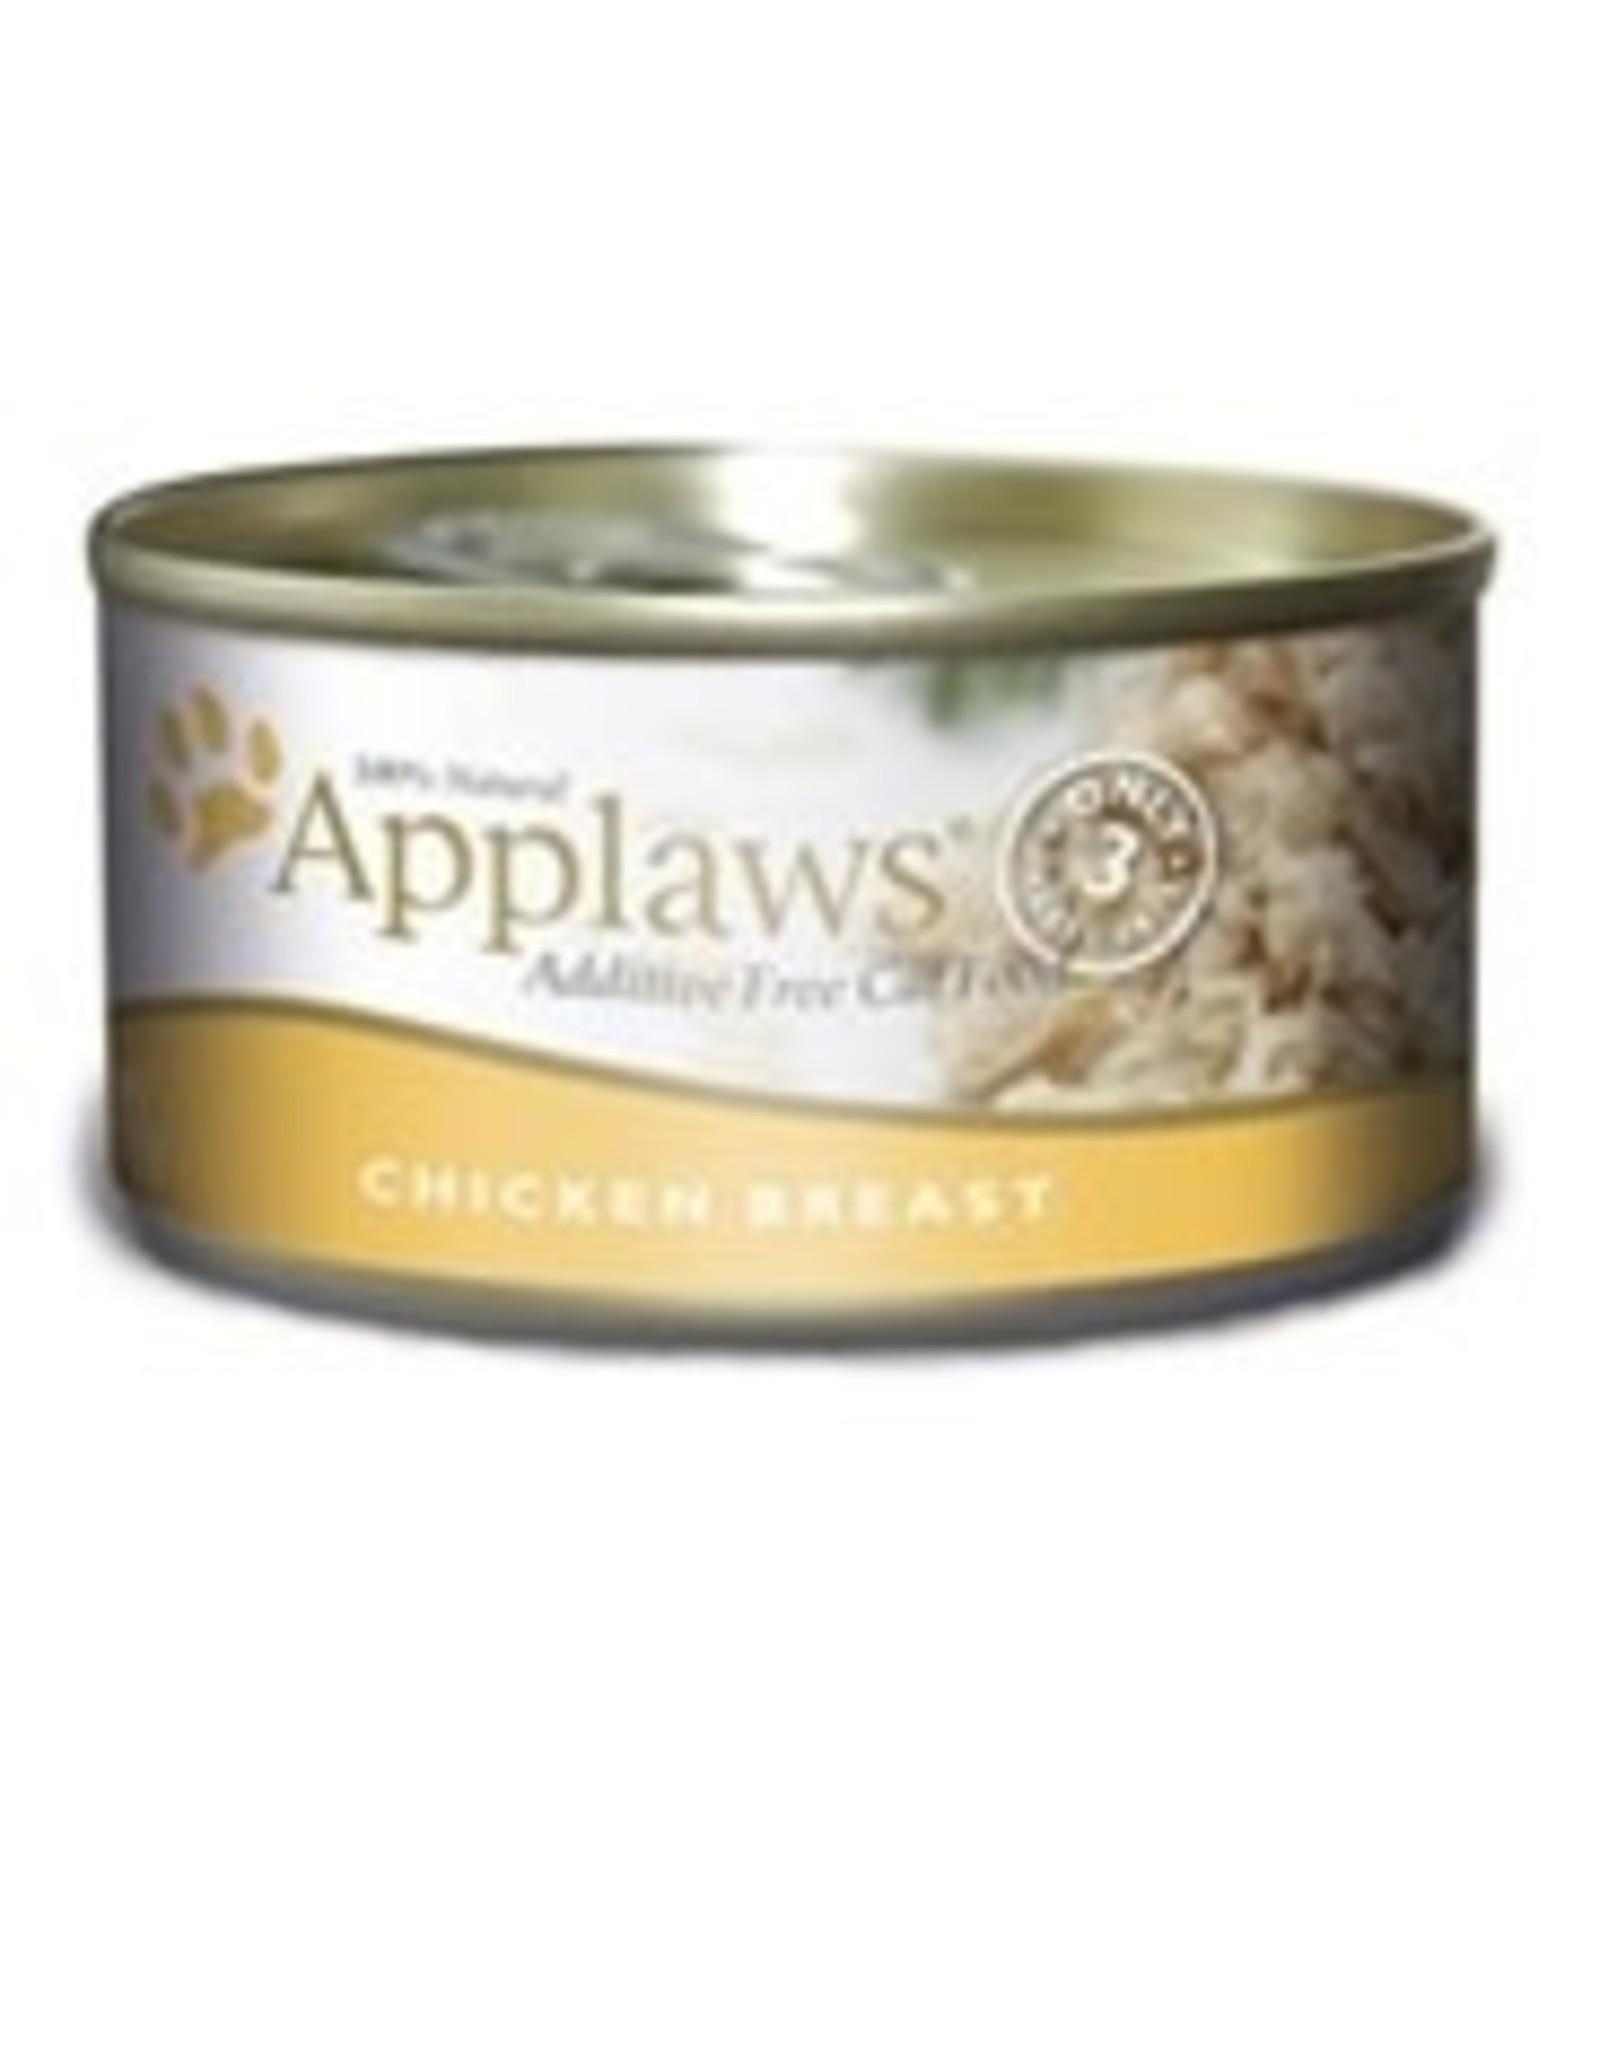 Applaws APPLAWS CAT CHICKEN BREAST 2.47OZ